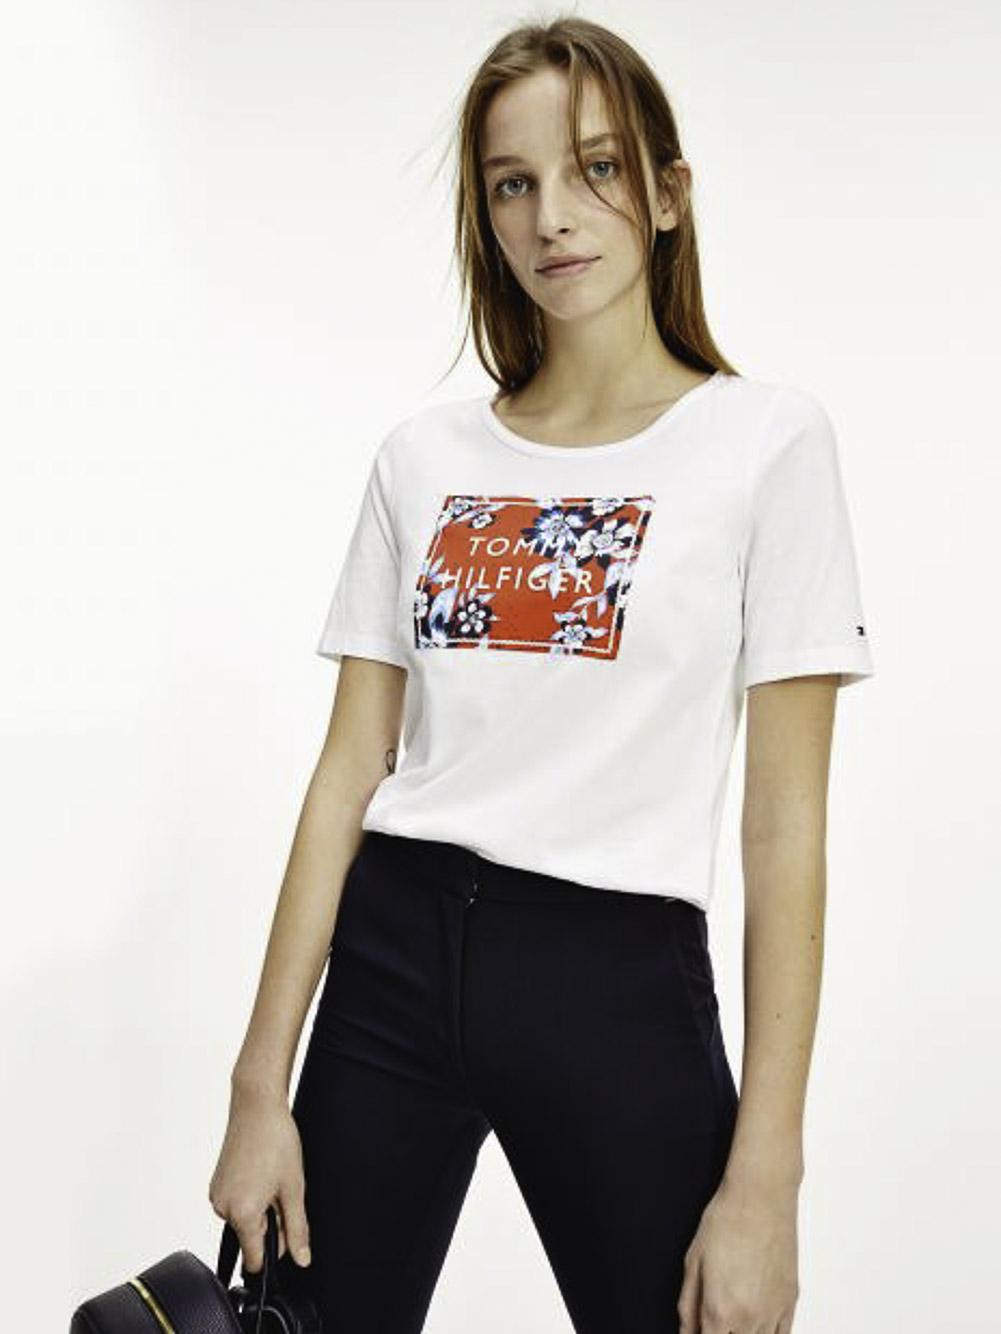 TOMMY HILFIGER Μπλούζα T-Shirt WW0WW30654-YBR ΛΕΥΚΟ